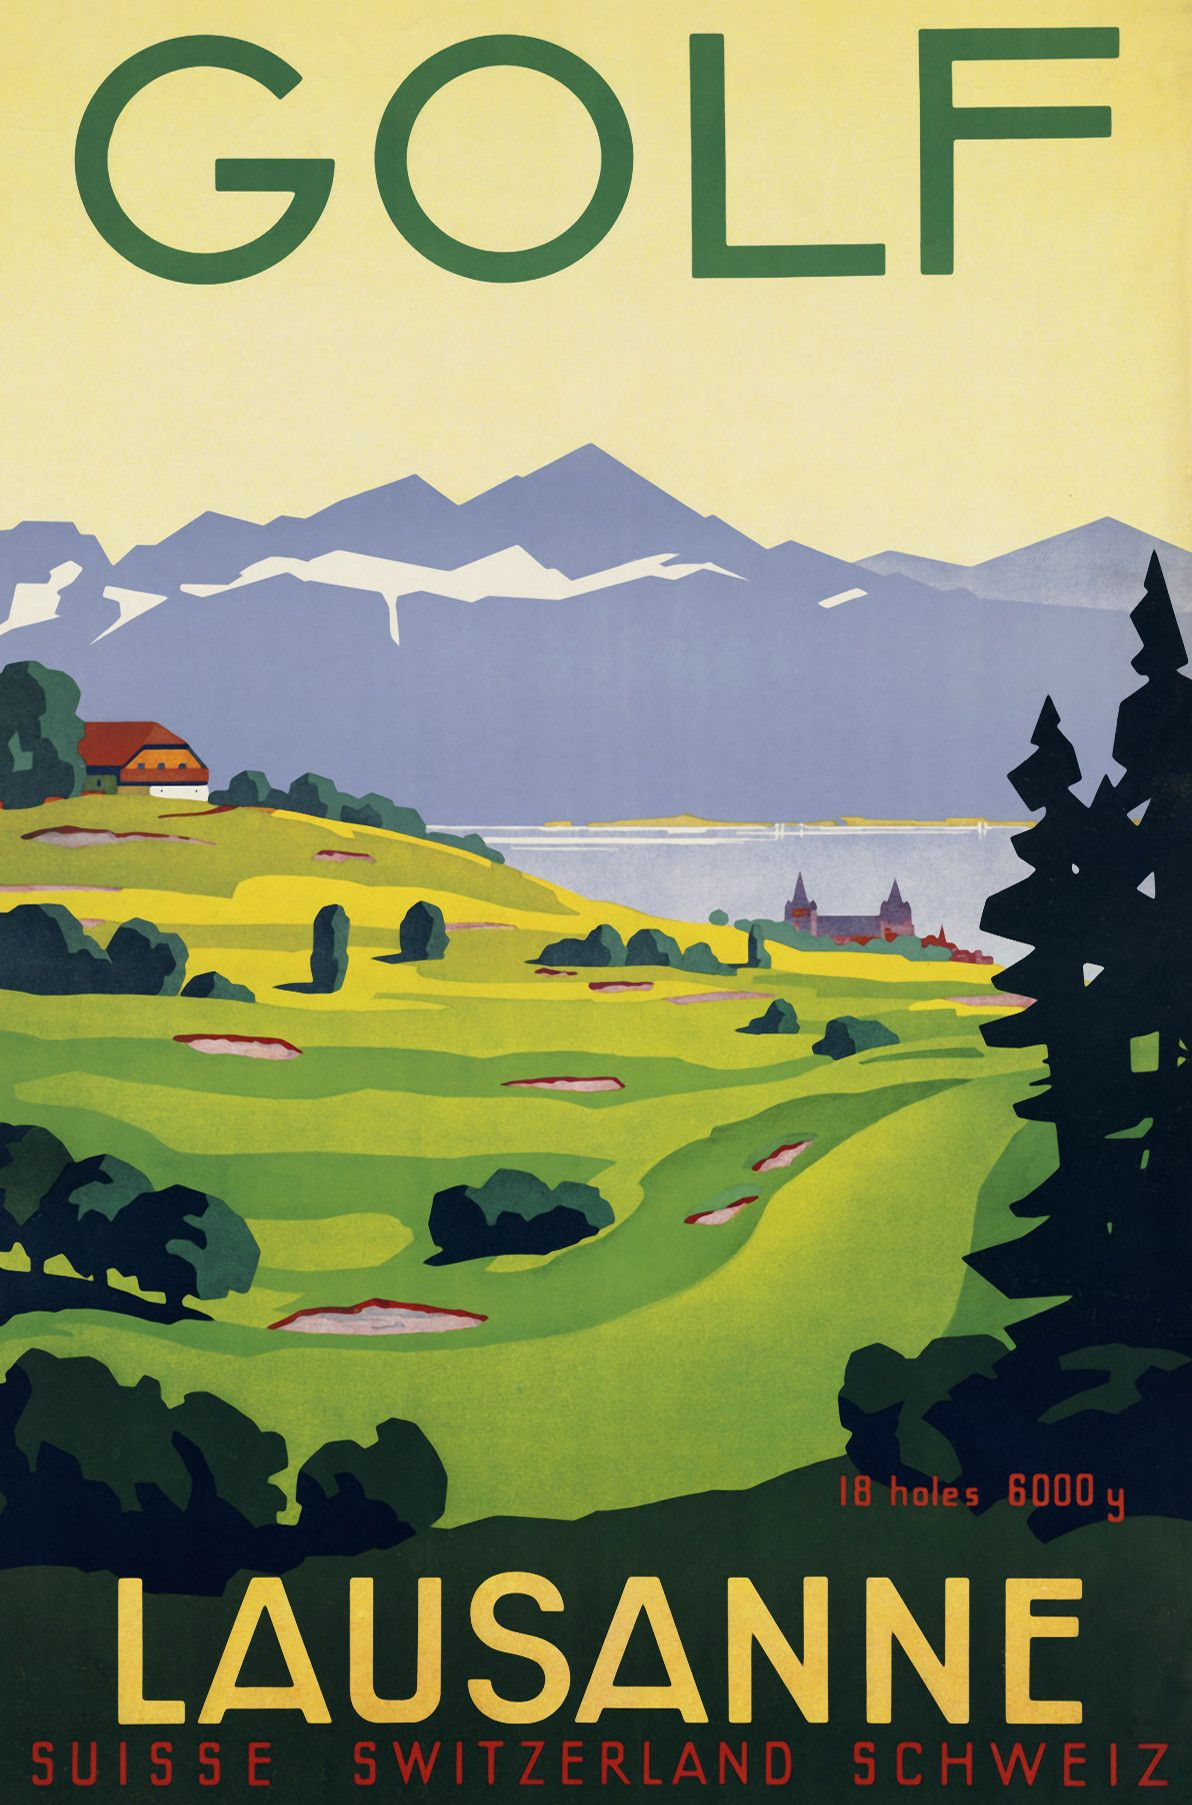 Vintage Golf Lausanne Vintage Travel Posters Travel Posters Golf Poster